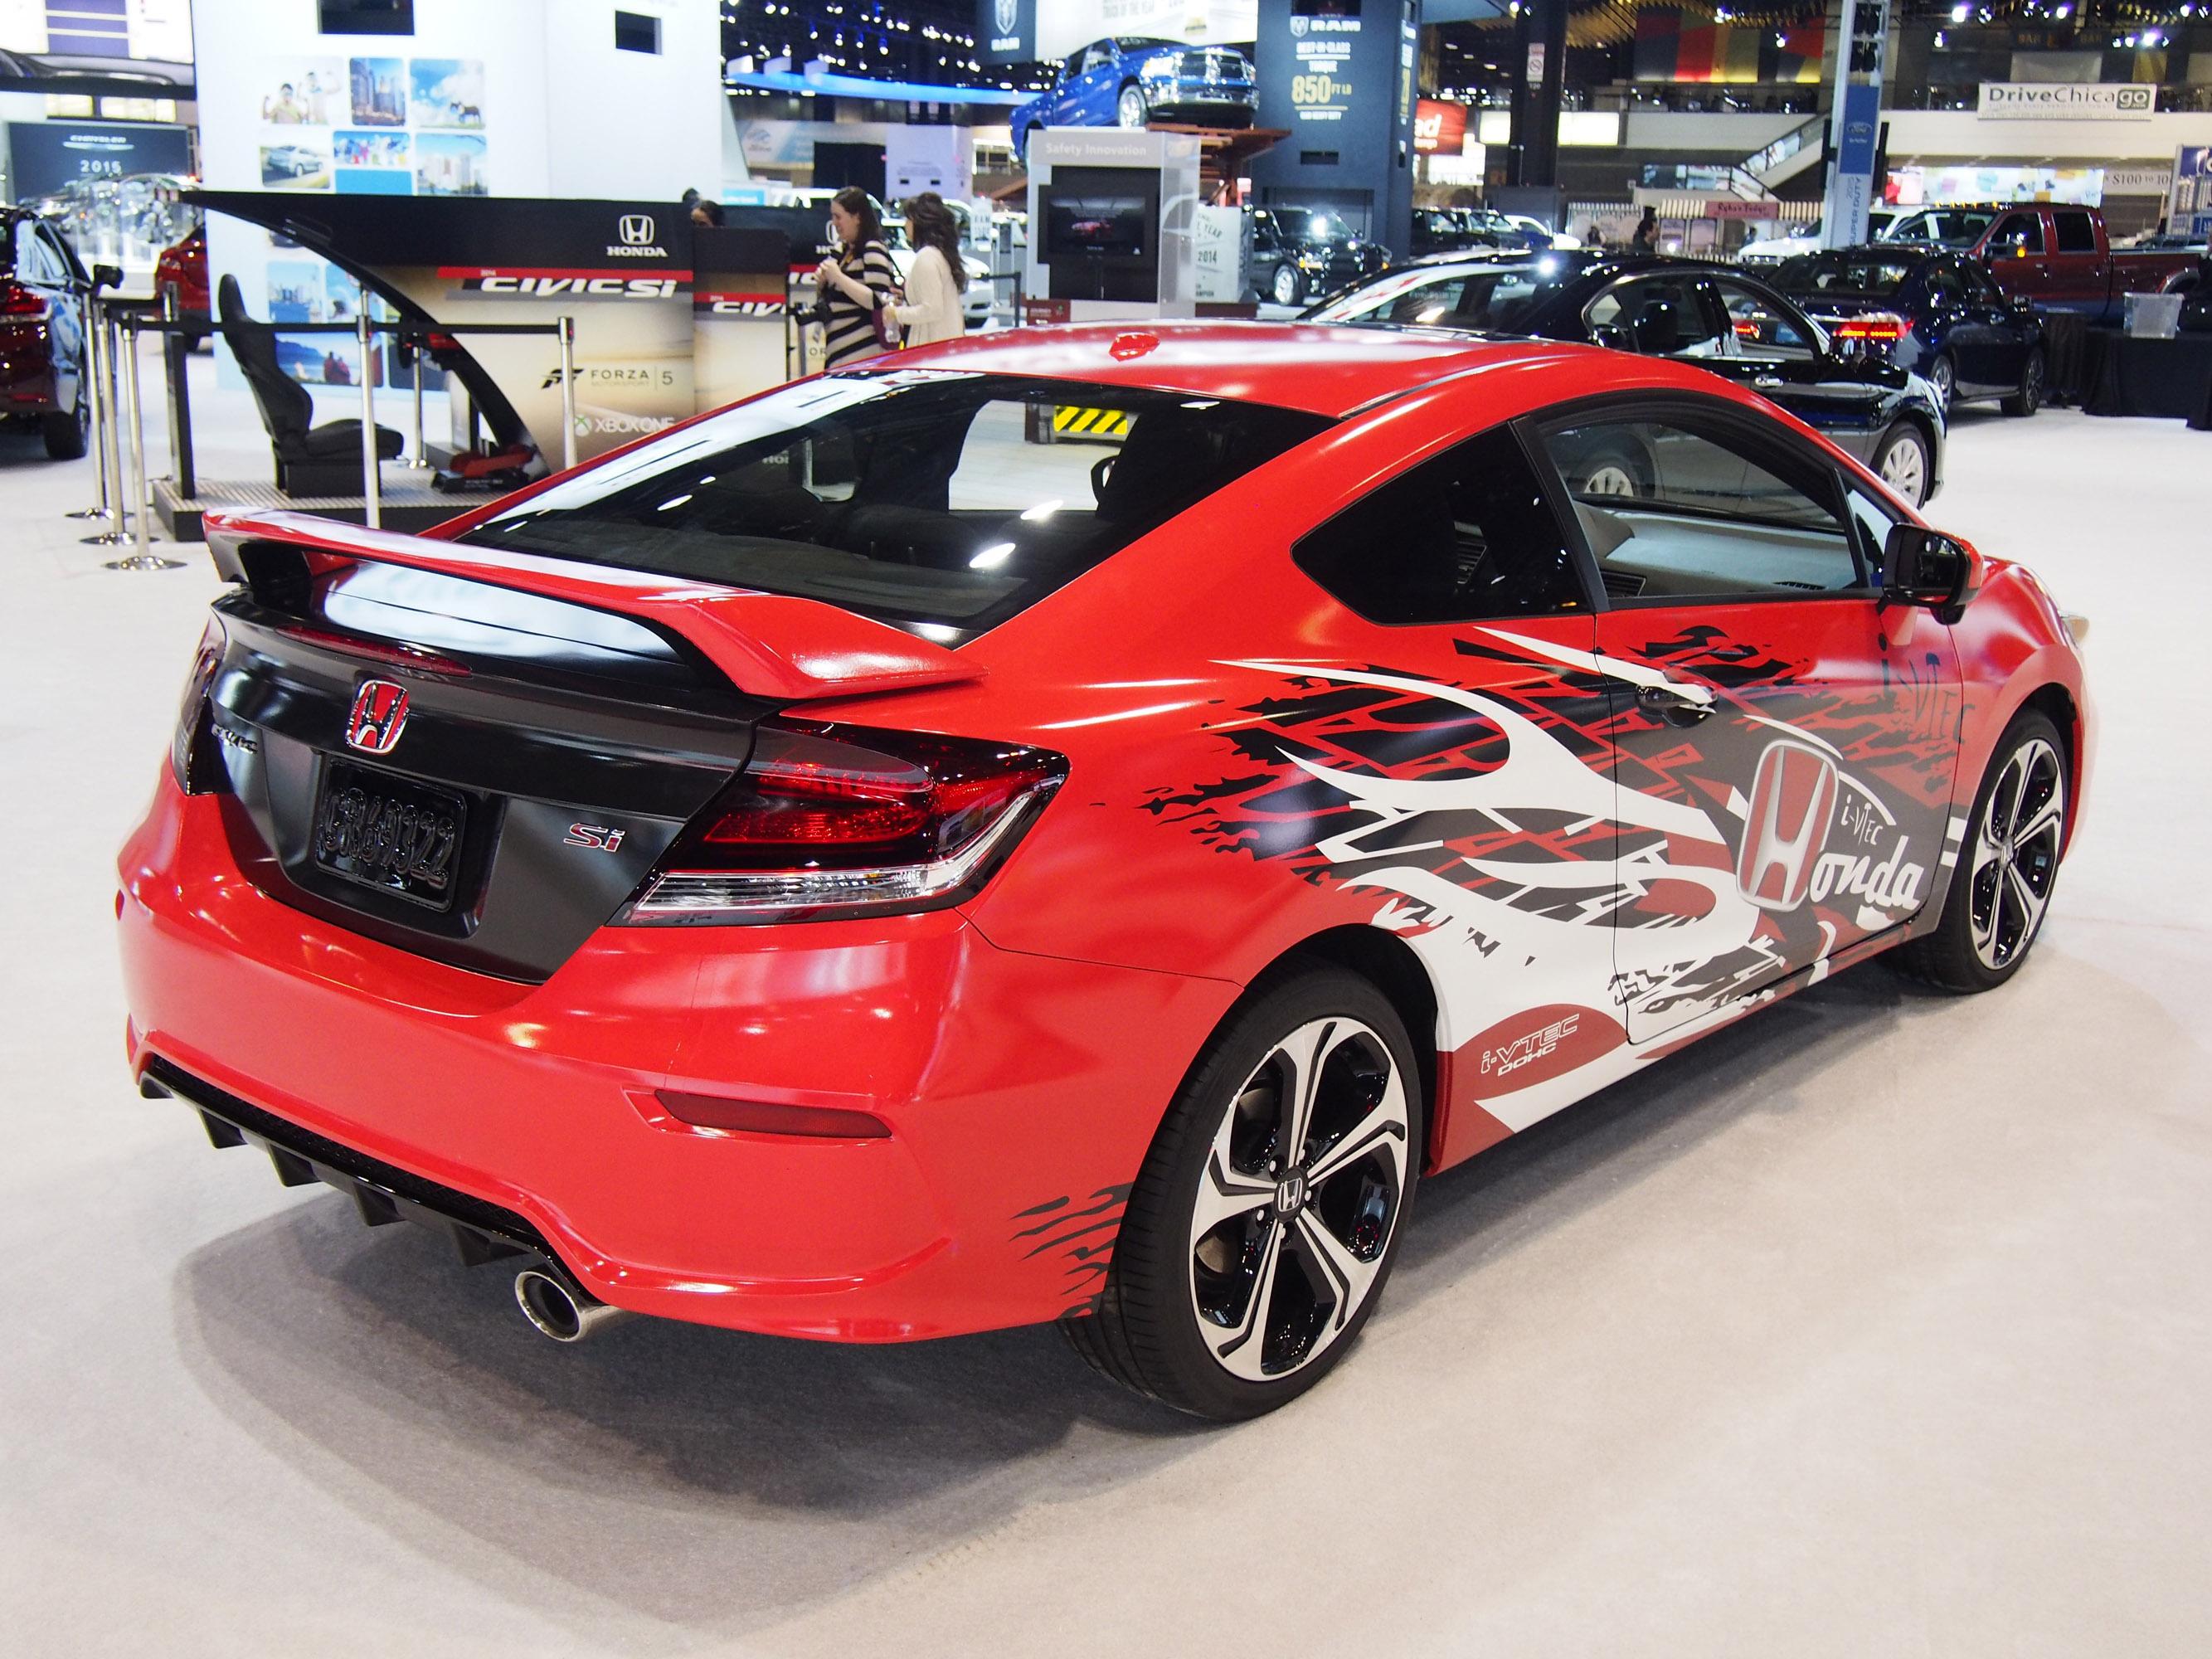 Honda Forza Motorsport Civic Si Design Winner Chicago 2014 ...